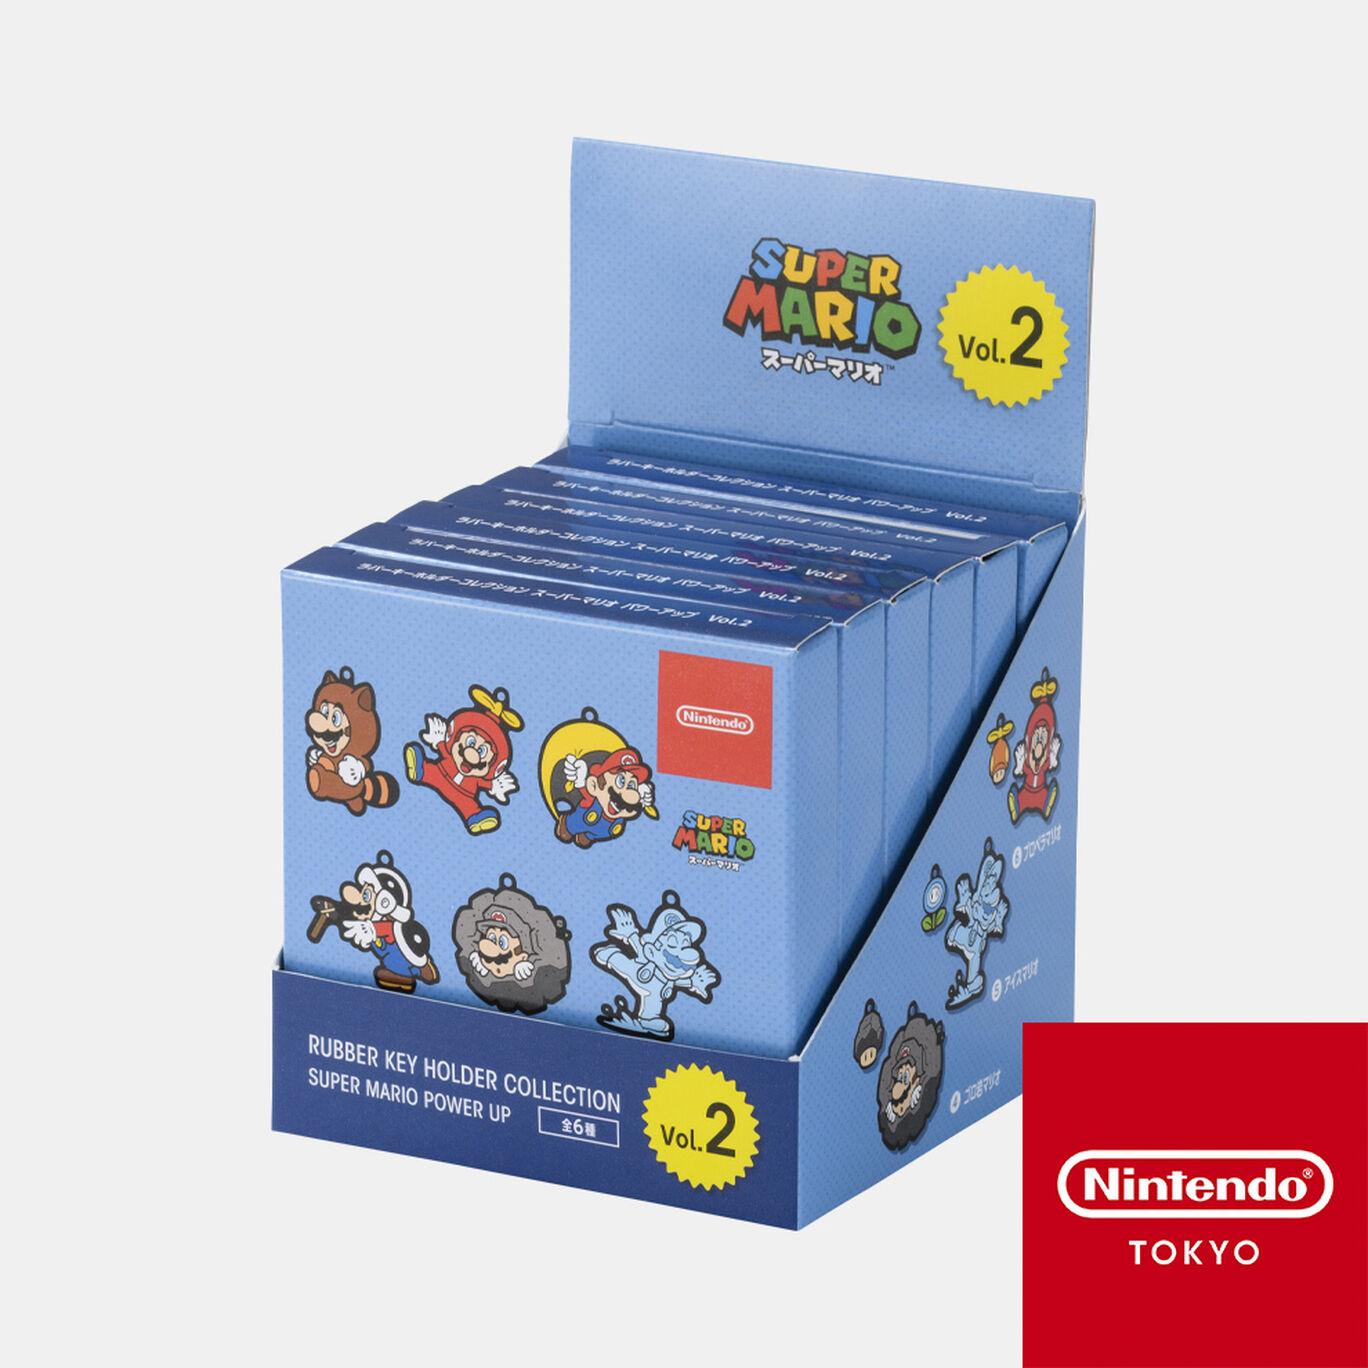 【BOX商品】ラバーキーホルダーコレクション スーパーマリオ パワーアップ 第二弾【Nintendo TOKYO取り扱い商品】